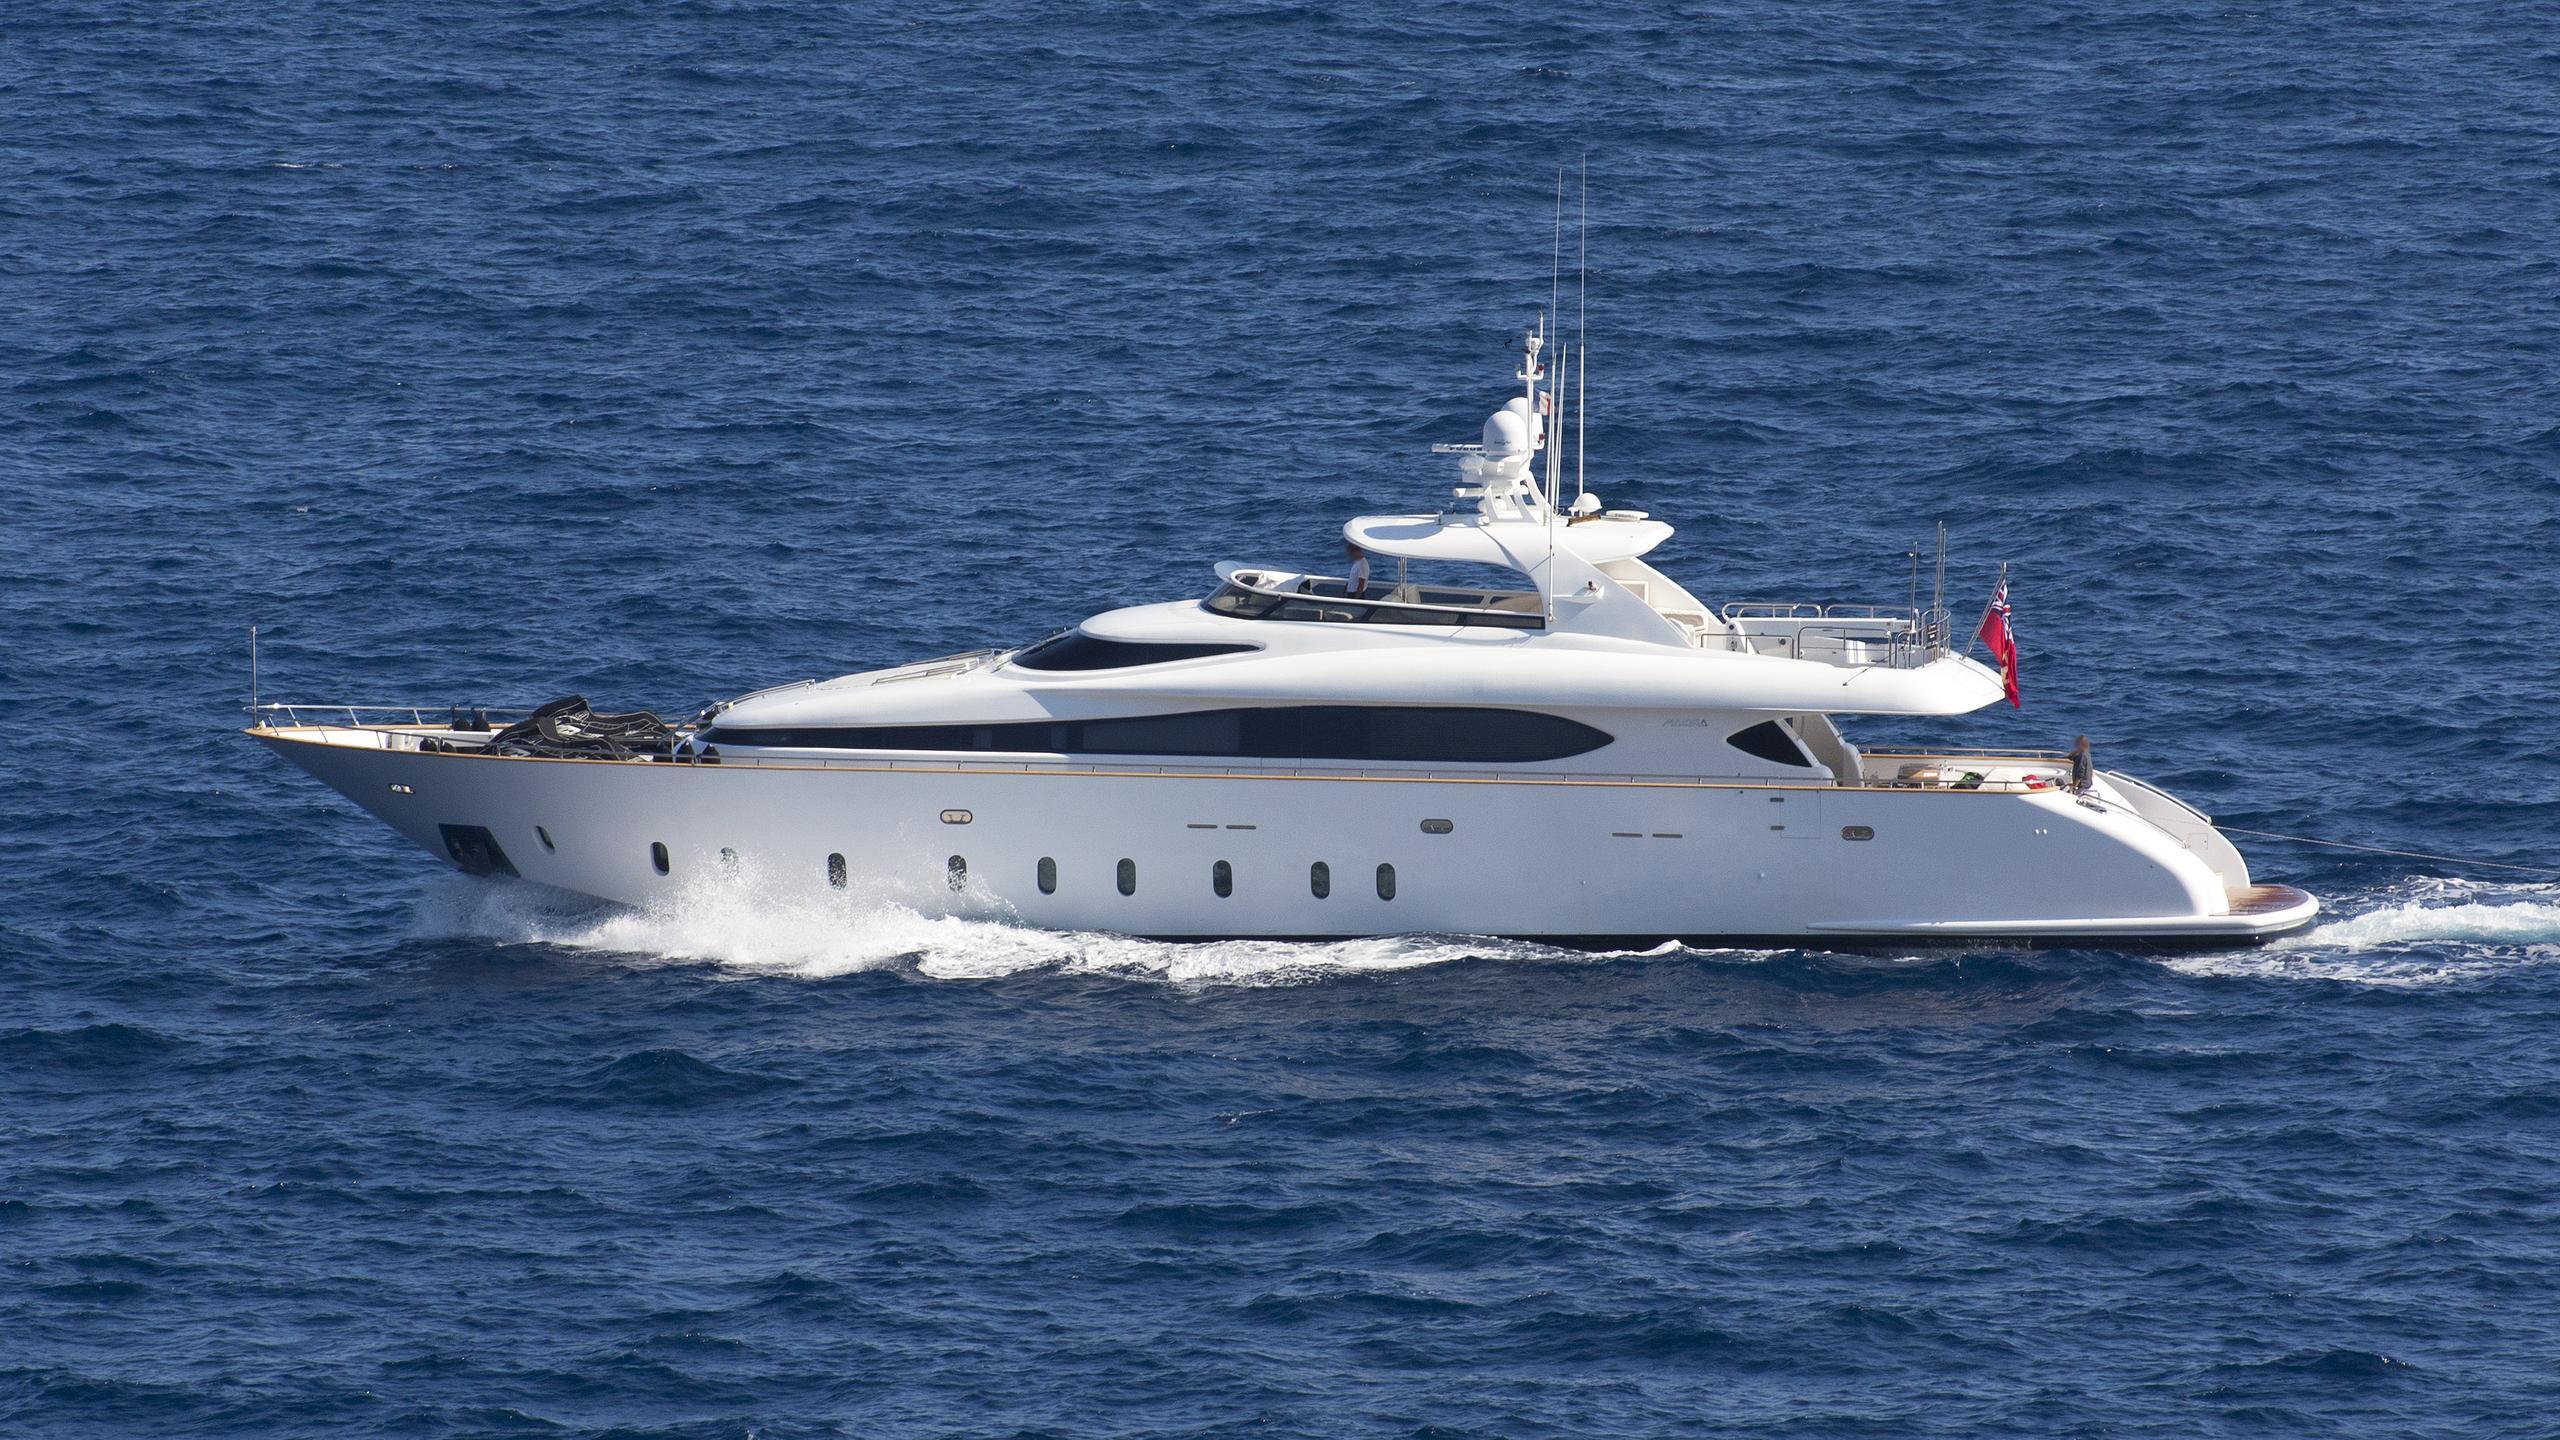 tuscan-sun-motor-yacht-maiora-32dp-2008-32m-cruising